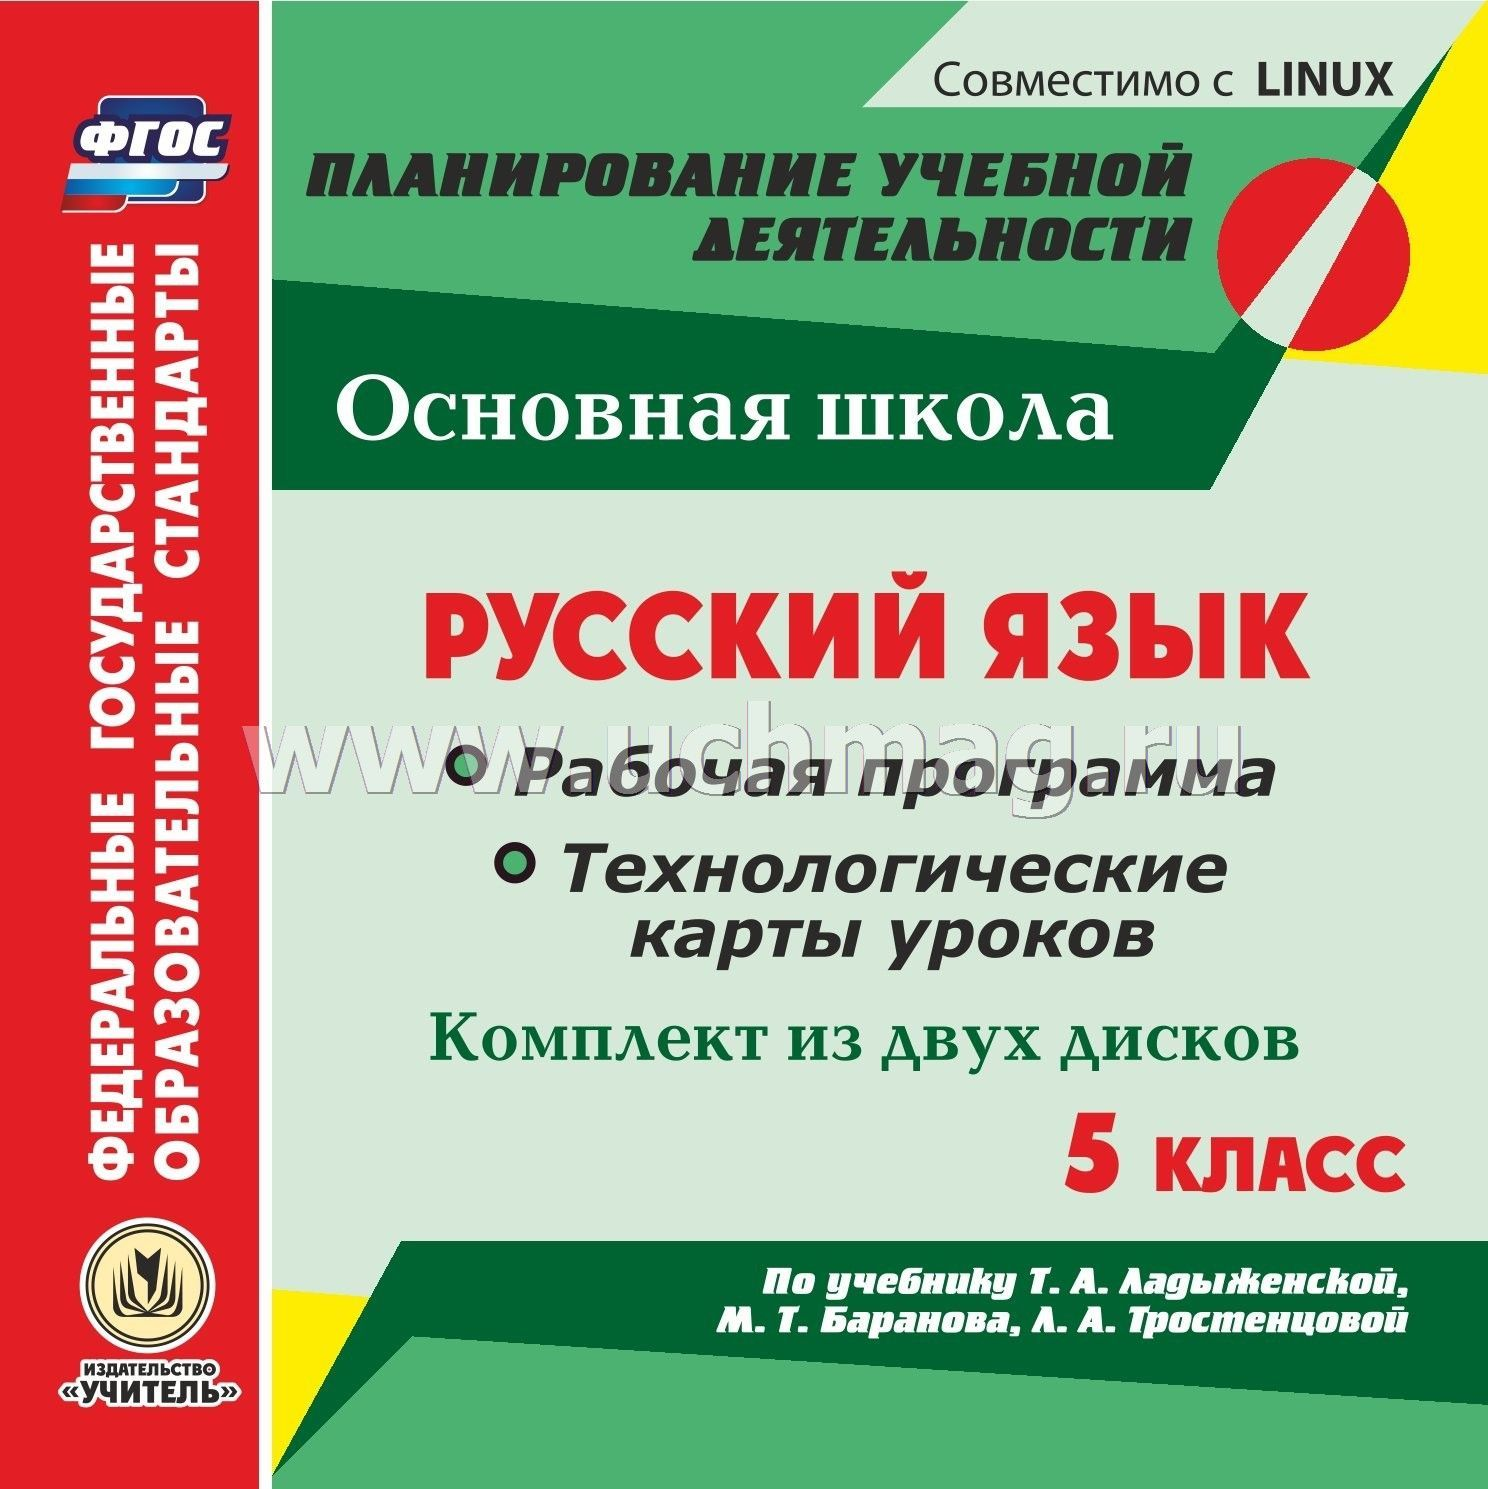 рабочая программа по русскому языку 6 класс рыбченкова фгос с ууд